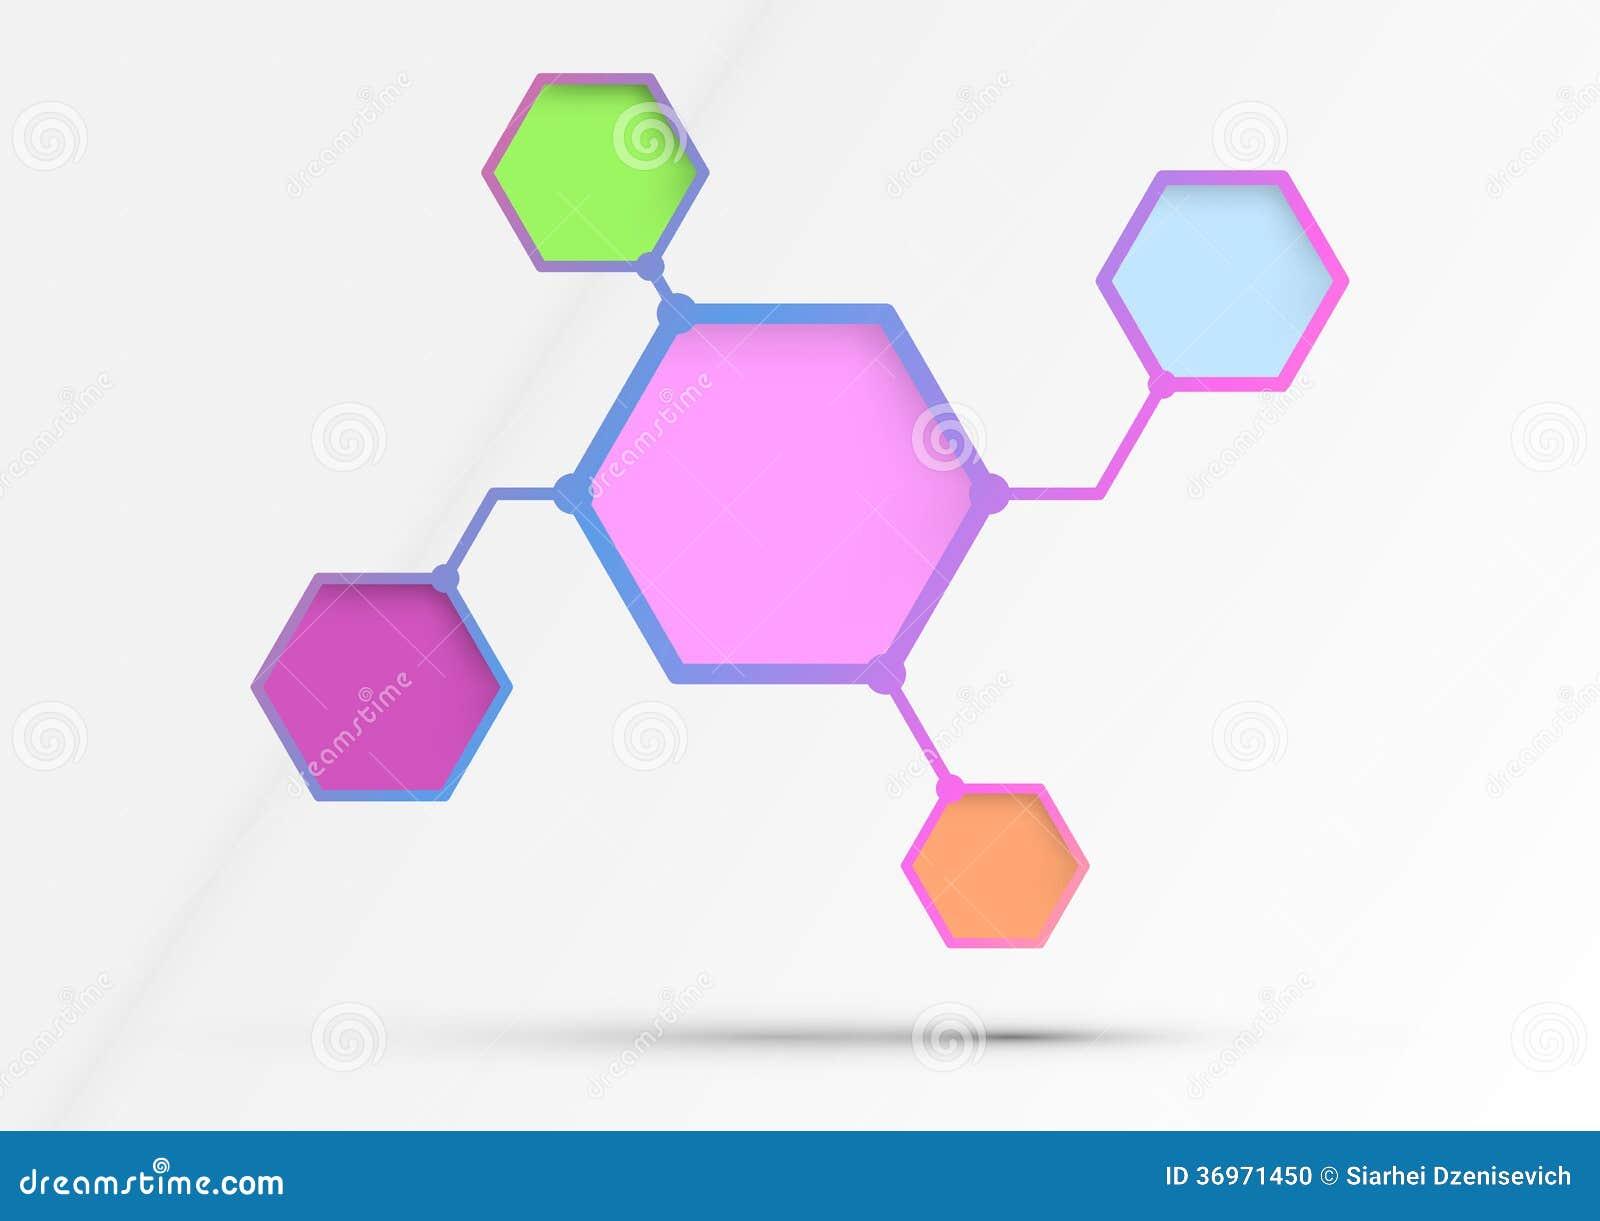 structured diagram   information in hexagons   alg stock photo    structured diagram   information in hexagons   alg